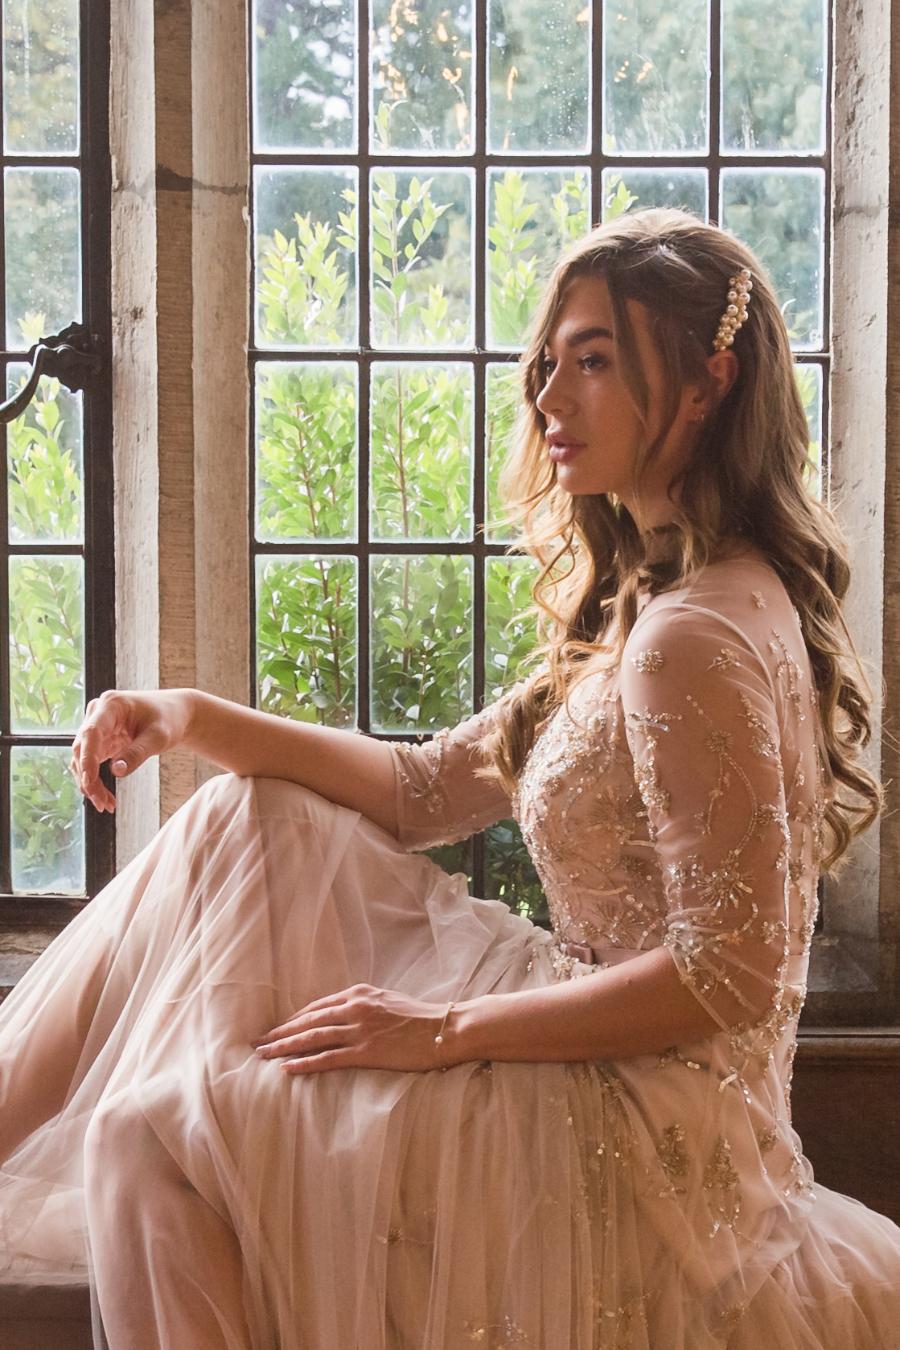 Jewel toned autumn wedding vibes from Layer Marney, image credit Ayshea Goldberg Photography (35)